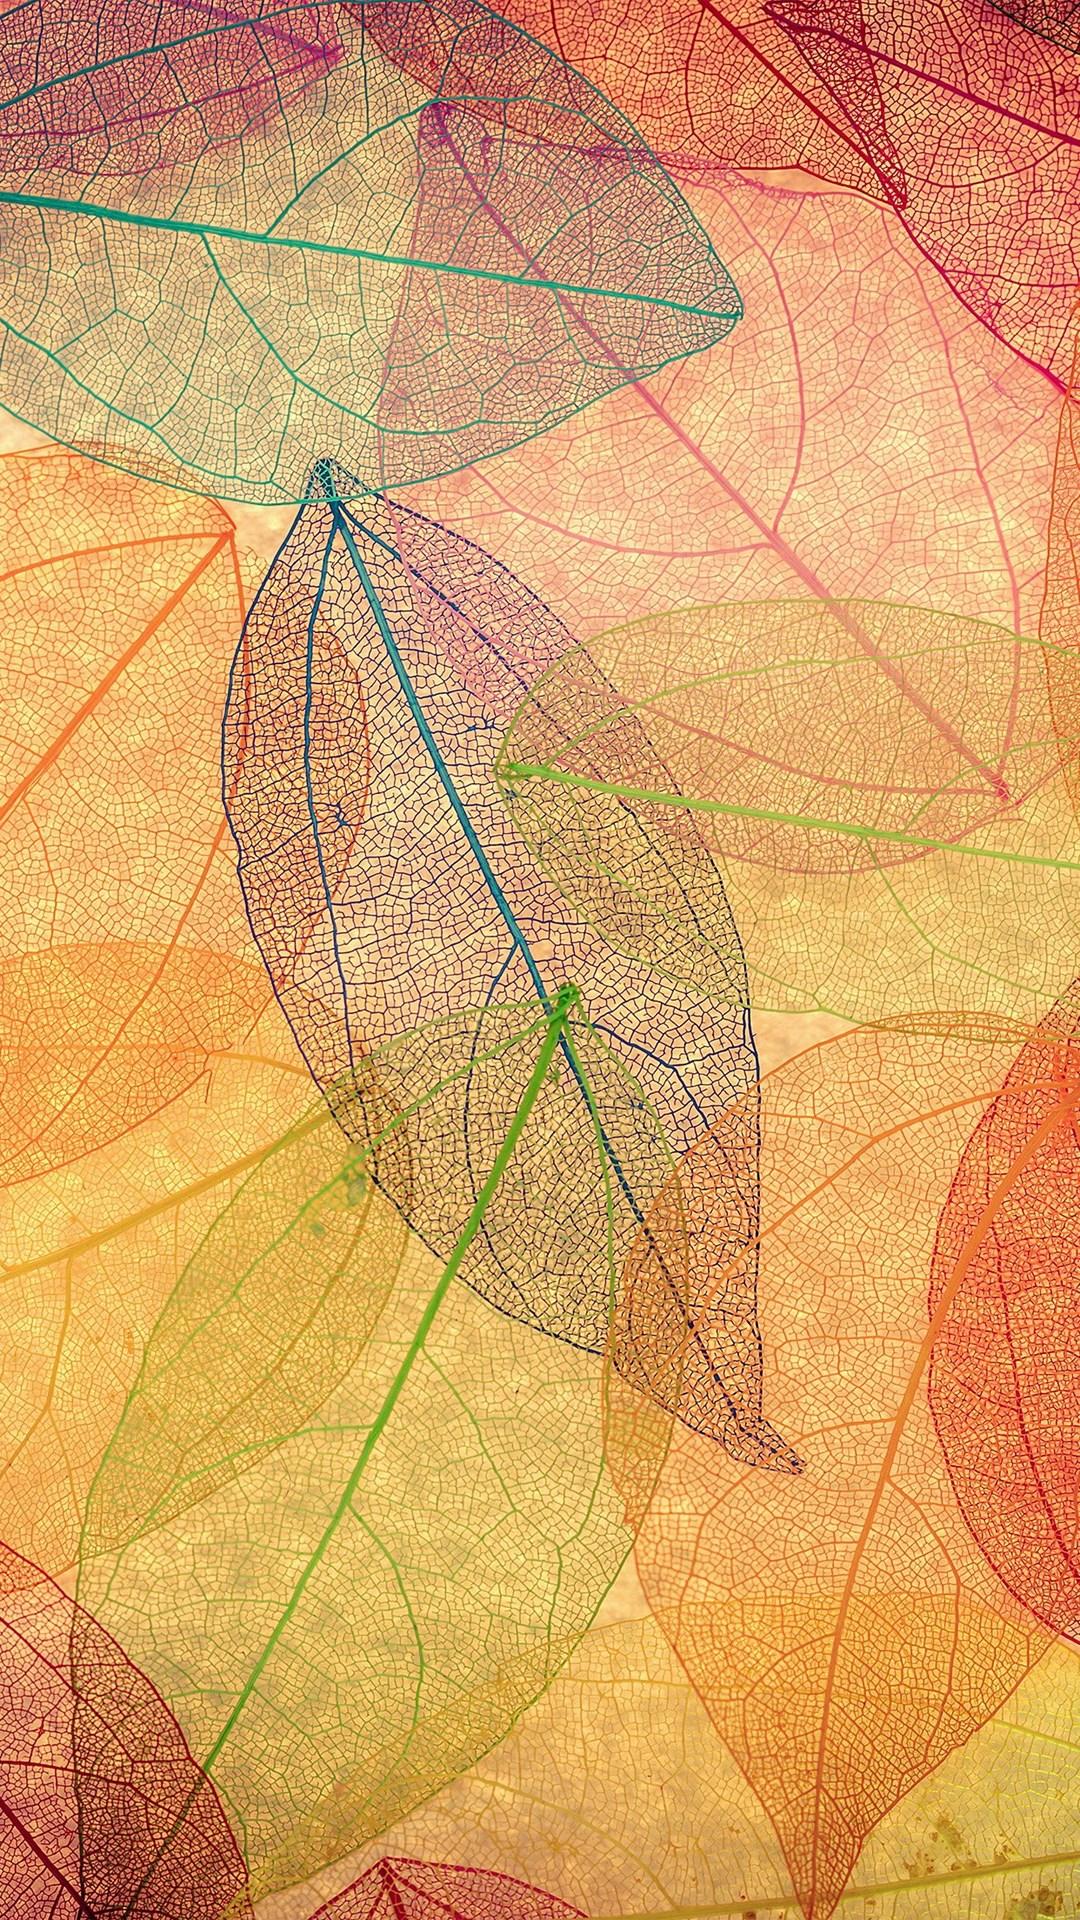 Fall Season Desktop Wallpaper Wallpapers Of The Week Autumn